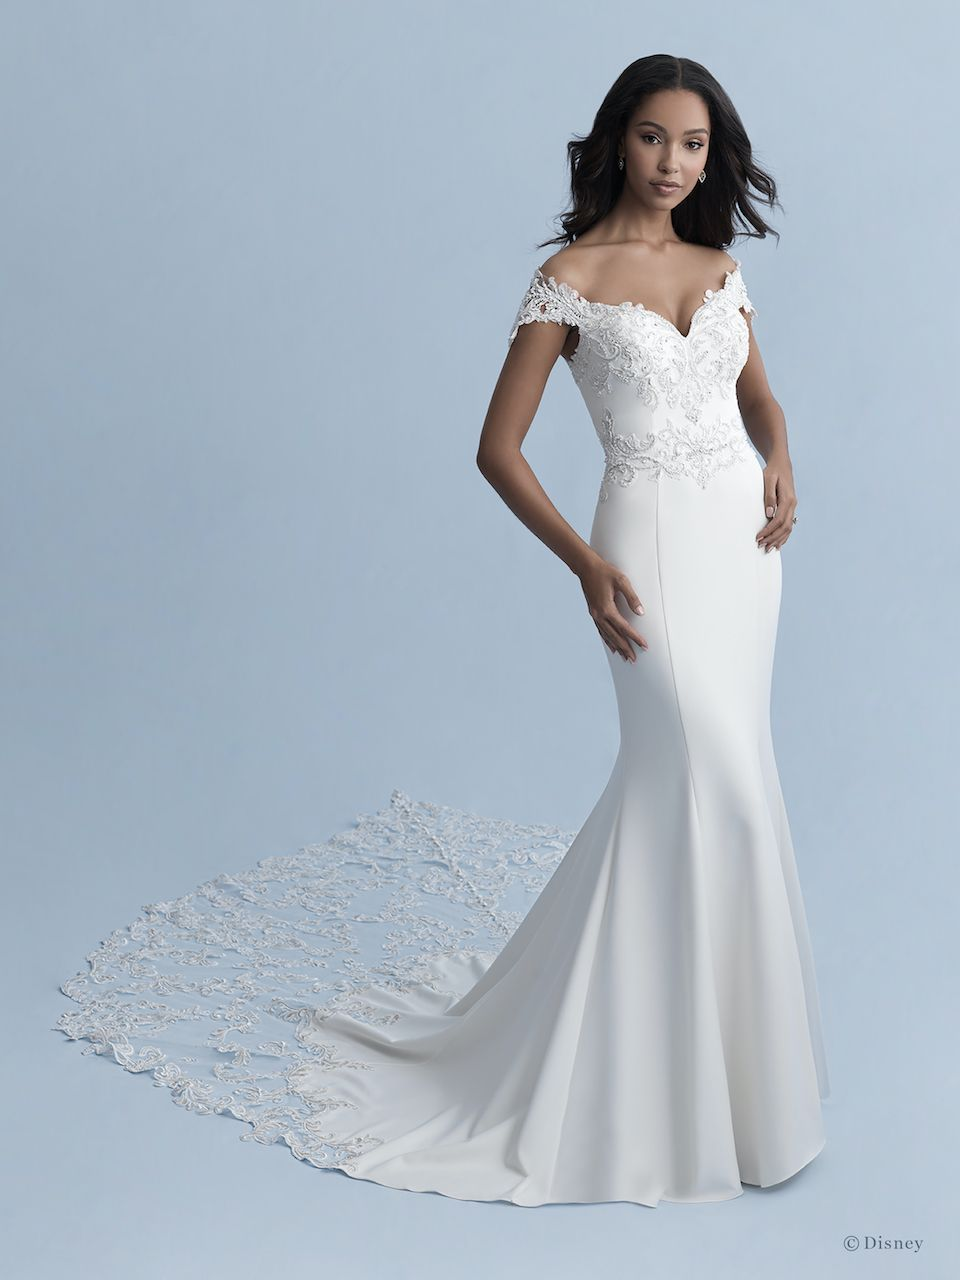 Off The Shoulder V Neckline Stretch Crepe Fit And Flare Wedding Dress With Lace Appliques Kleinfeld Bridal Disney Wedding Dresses Jasmine Wedding Dress Fitted Wedding Dress [ 1280 x 960 Pixel ]